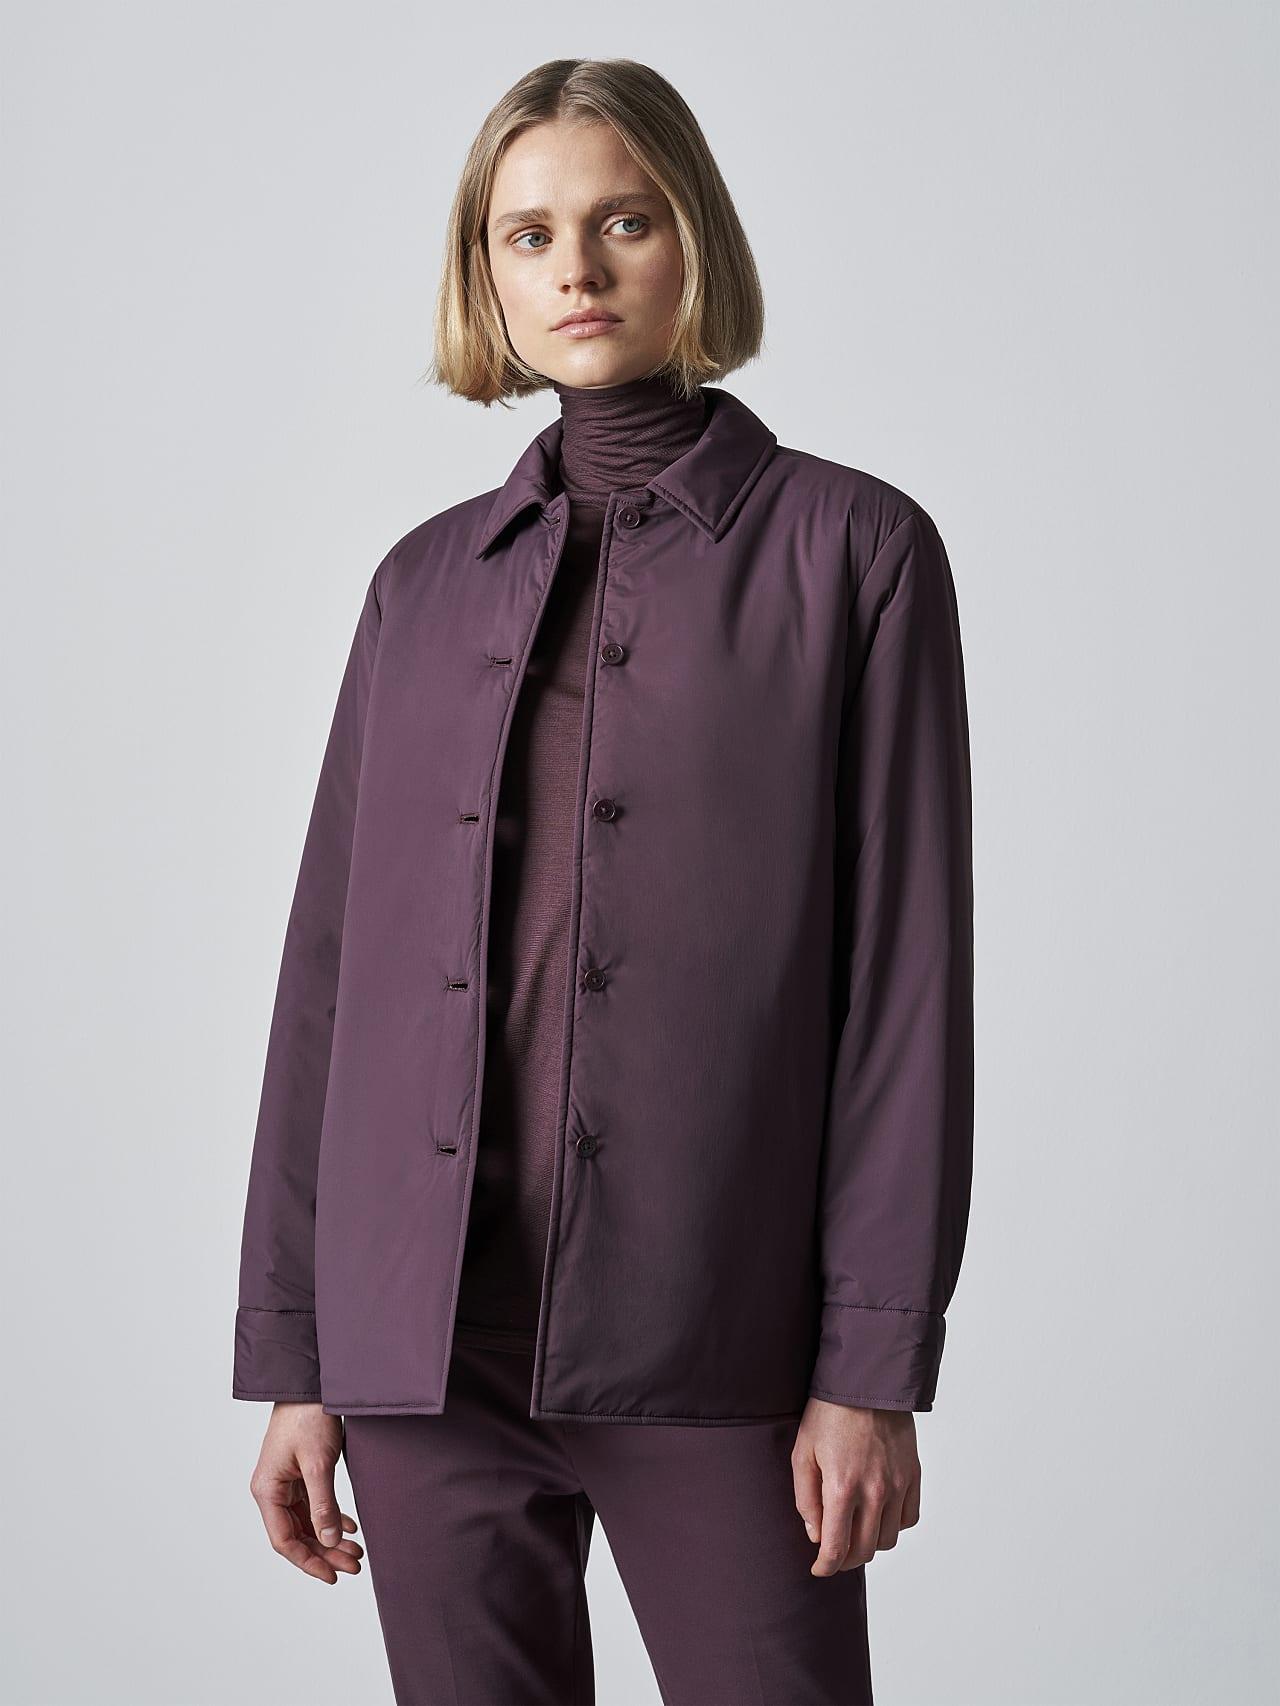 OSHEN V1.Y5.02 PrimaLoft® Overshirt Jacket Burgundy Front Alpha Tauri